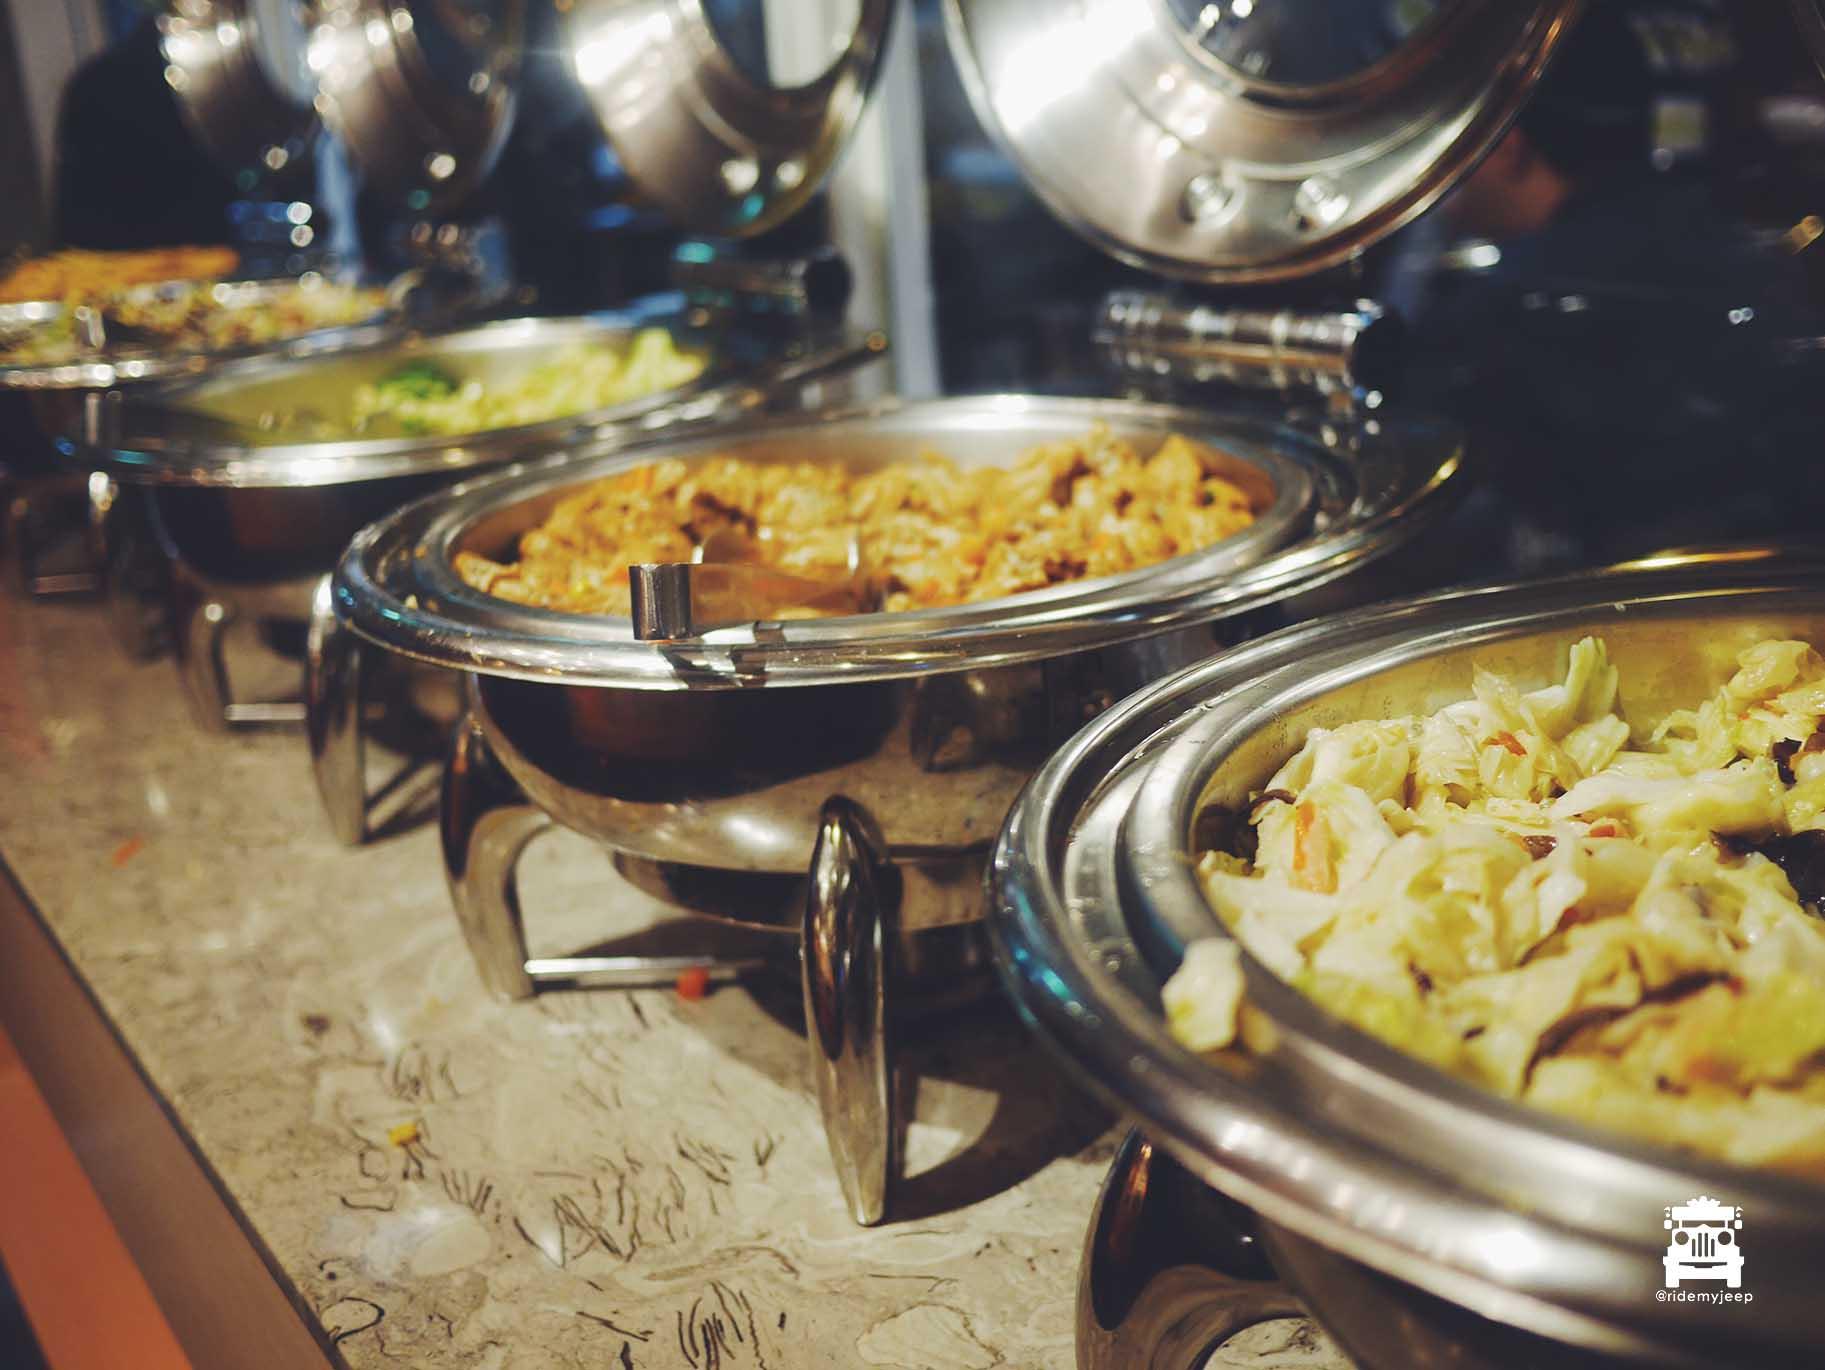 Stir-fried veggies for breakfast, anyone?